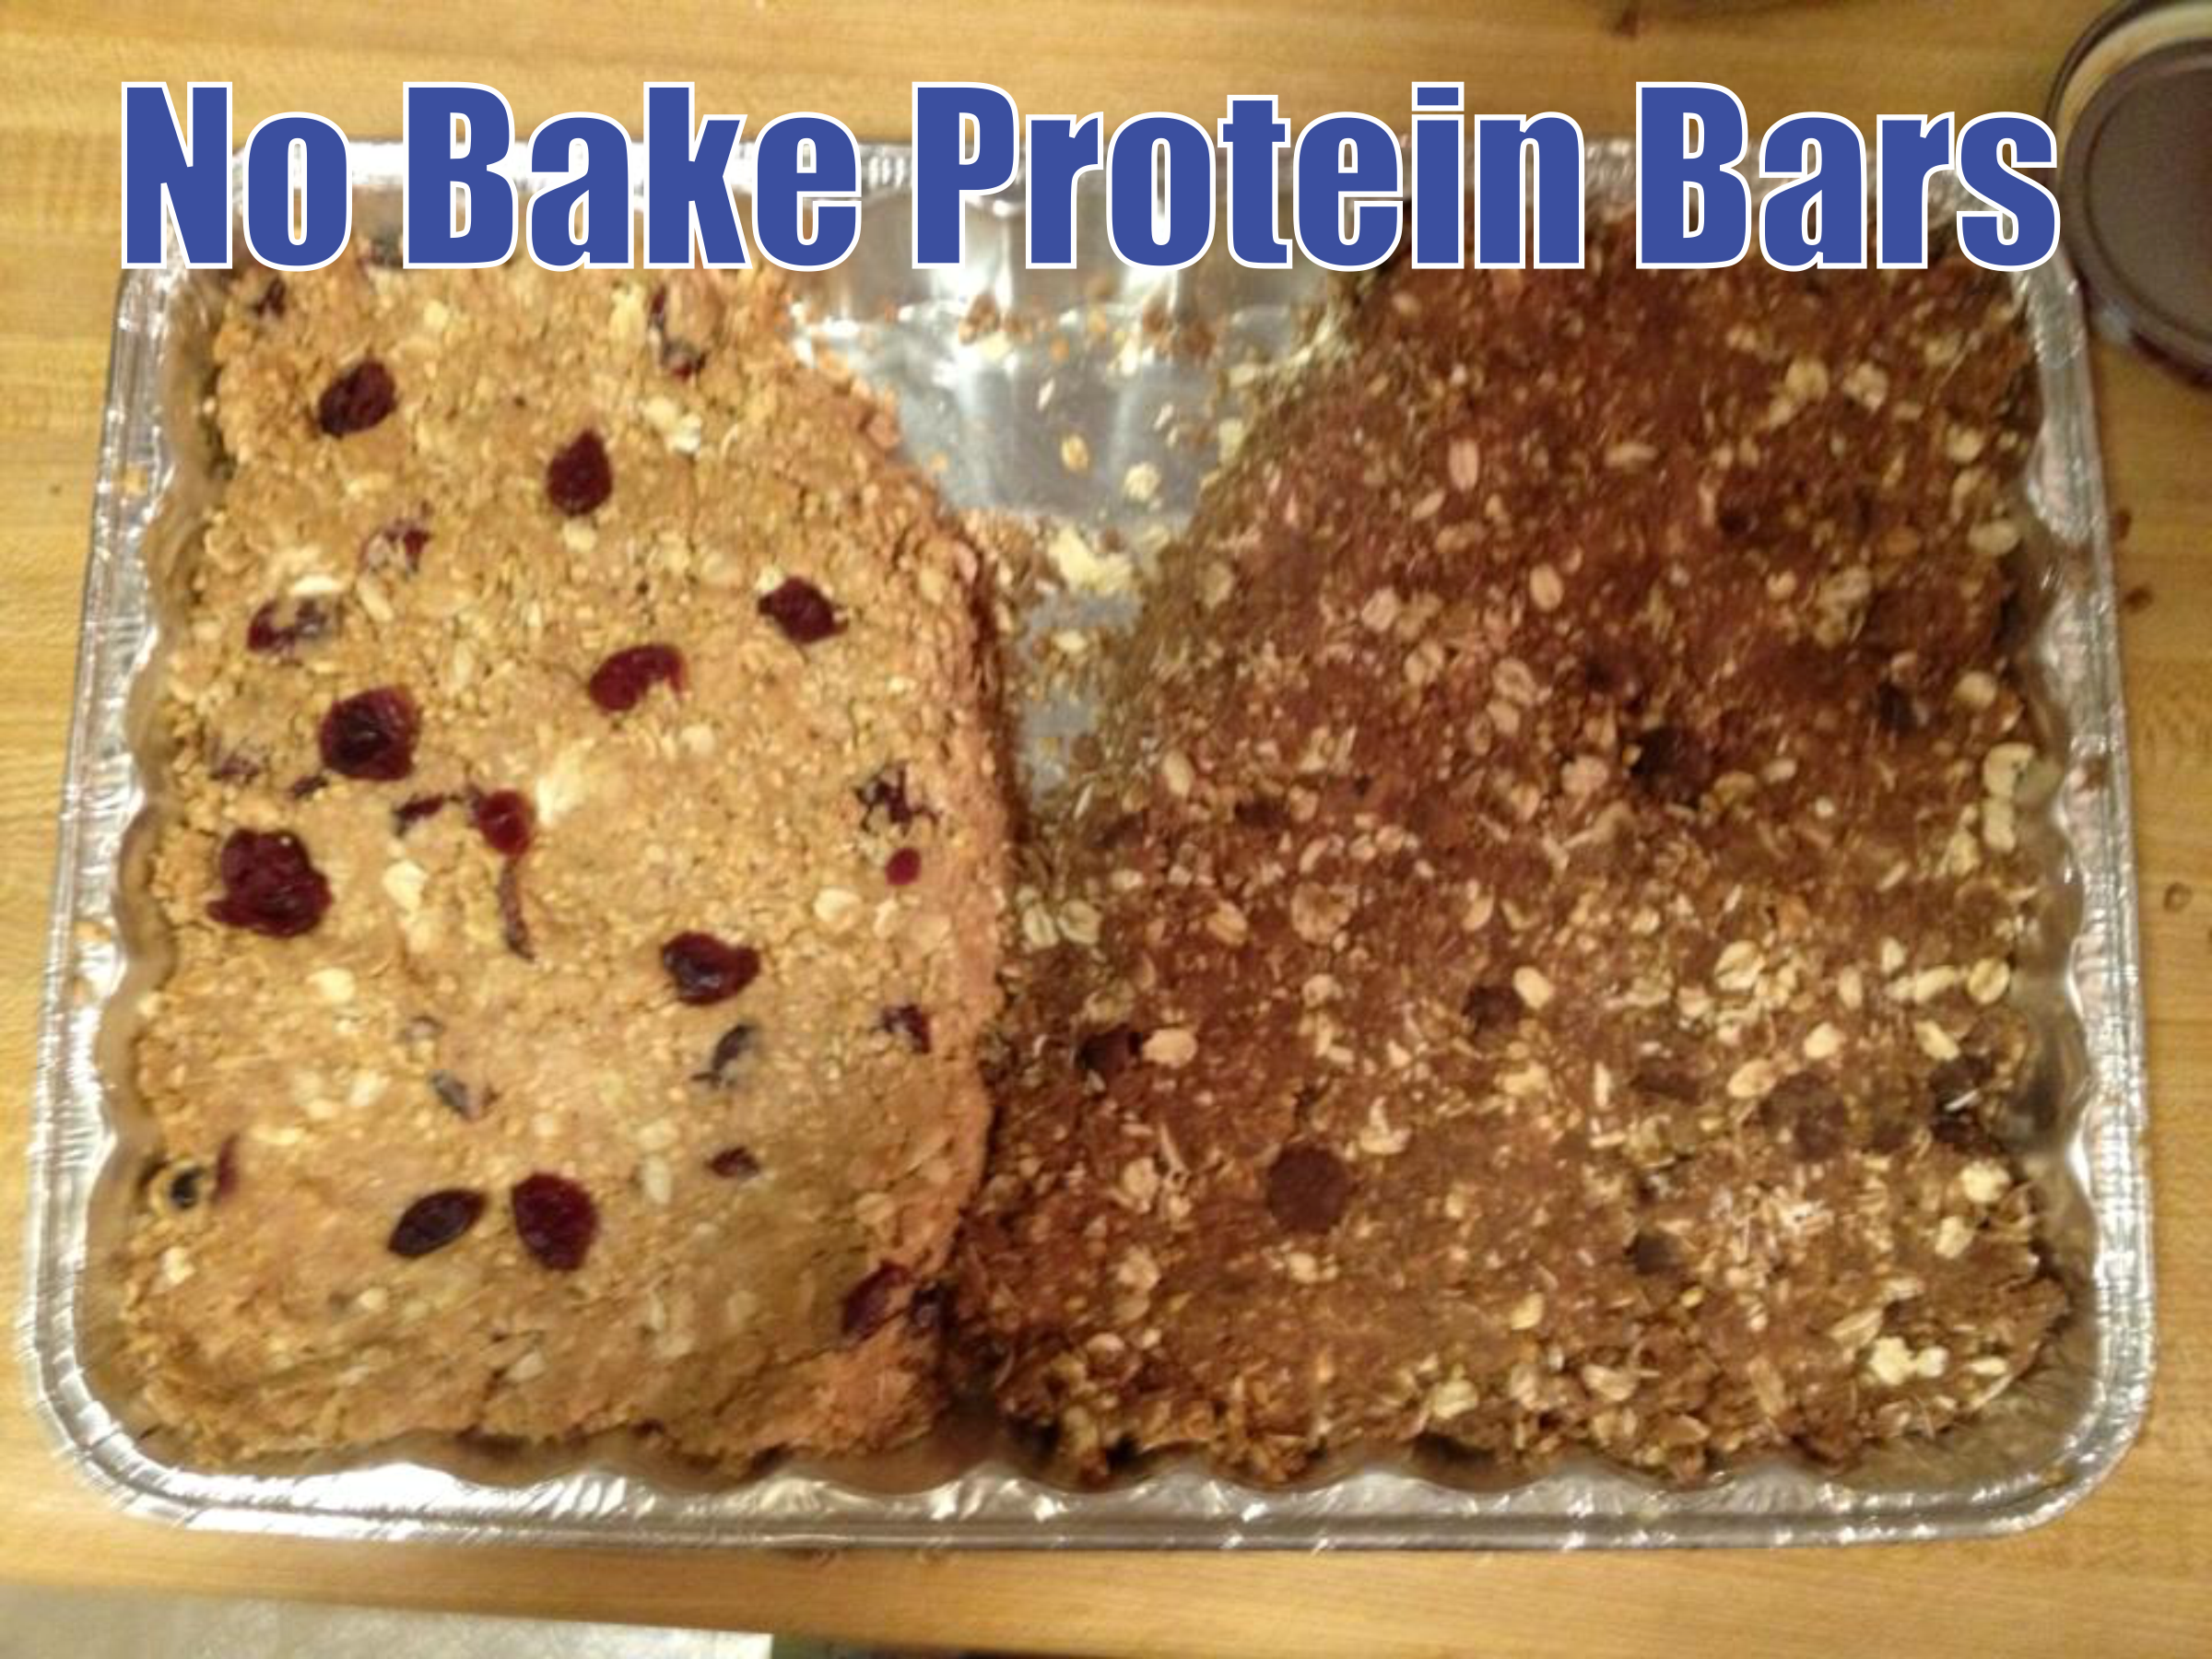 No Bake Protein Bars